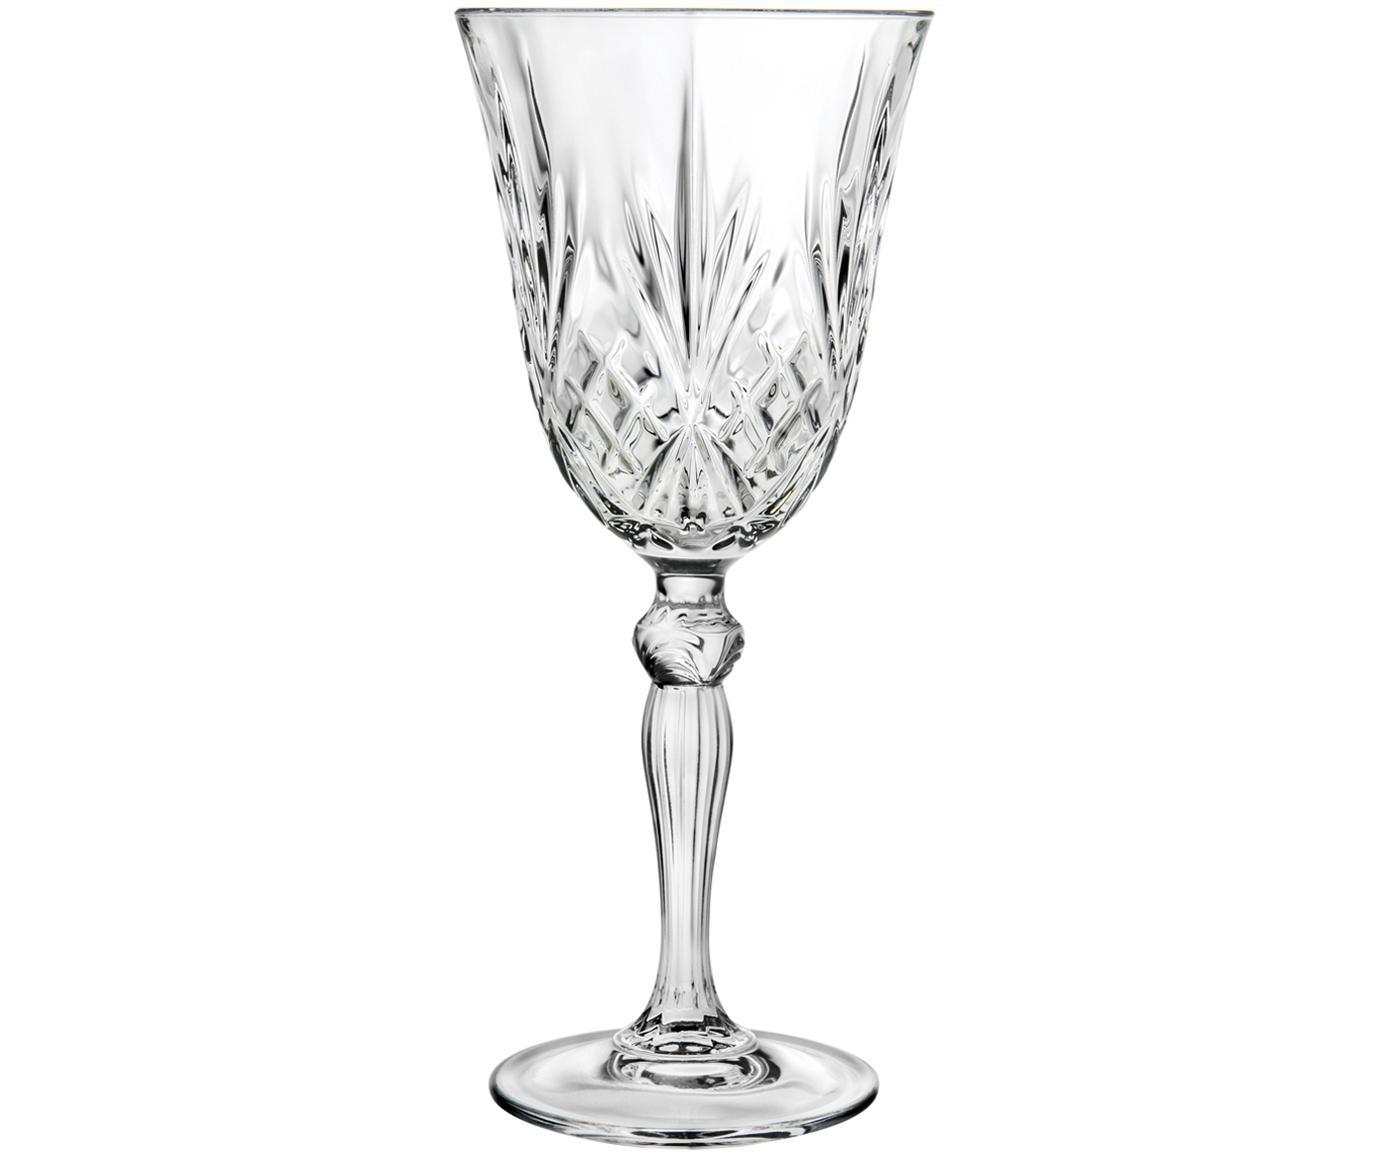 Copas de vino blanco de cristal Melodia, 6uds., Cristal, Transparente, Ø 8 x Al 19 cm